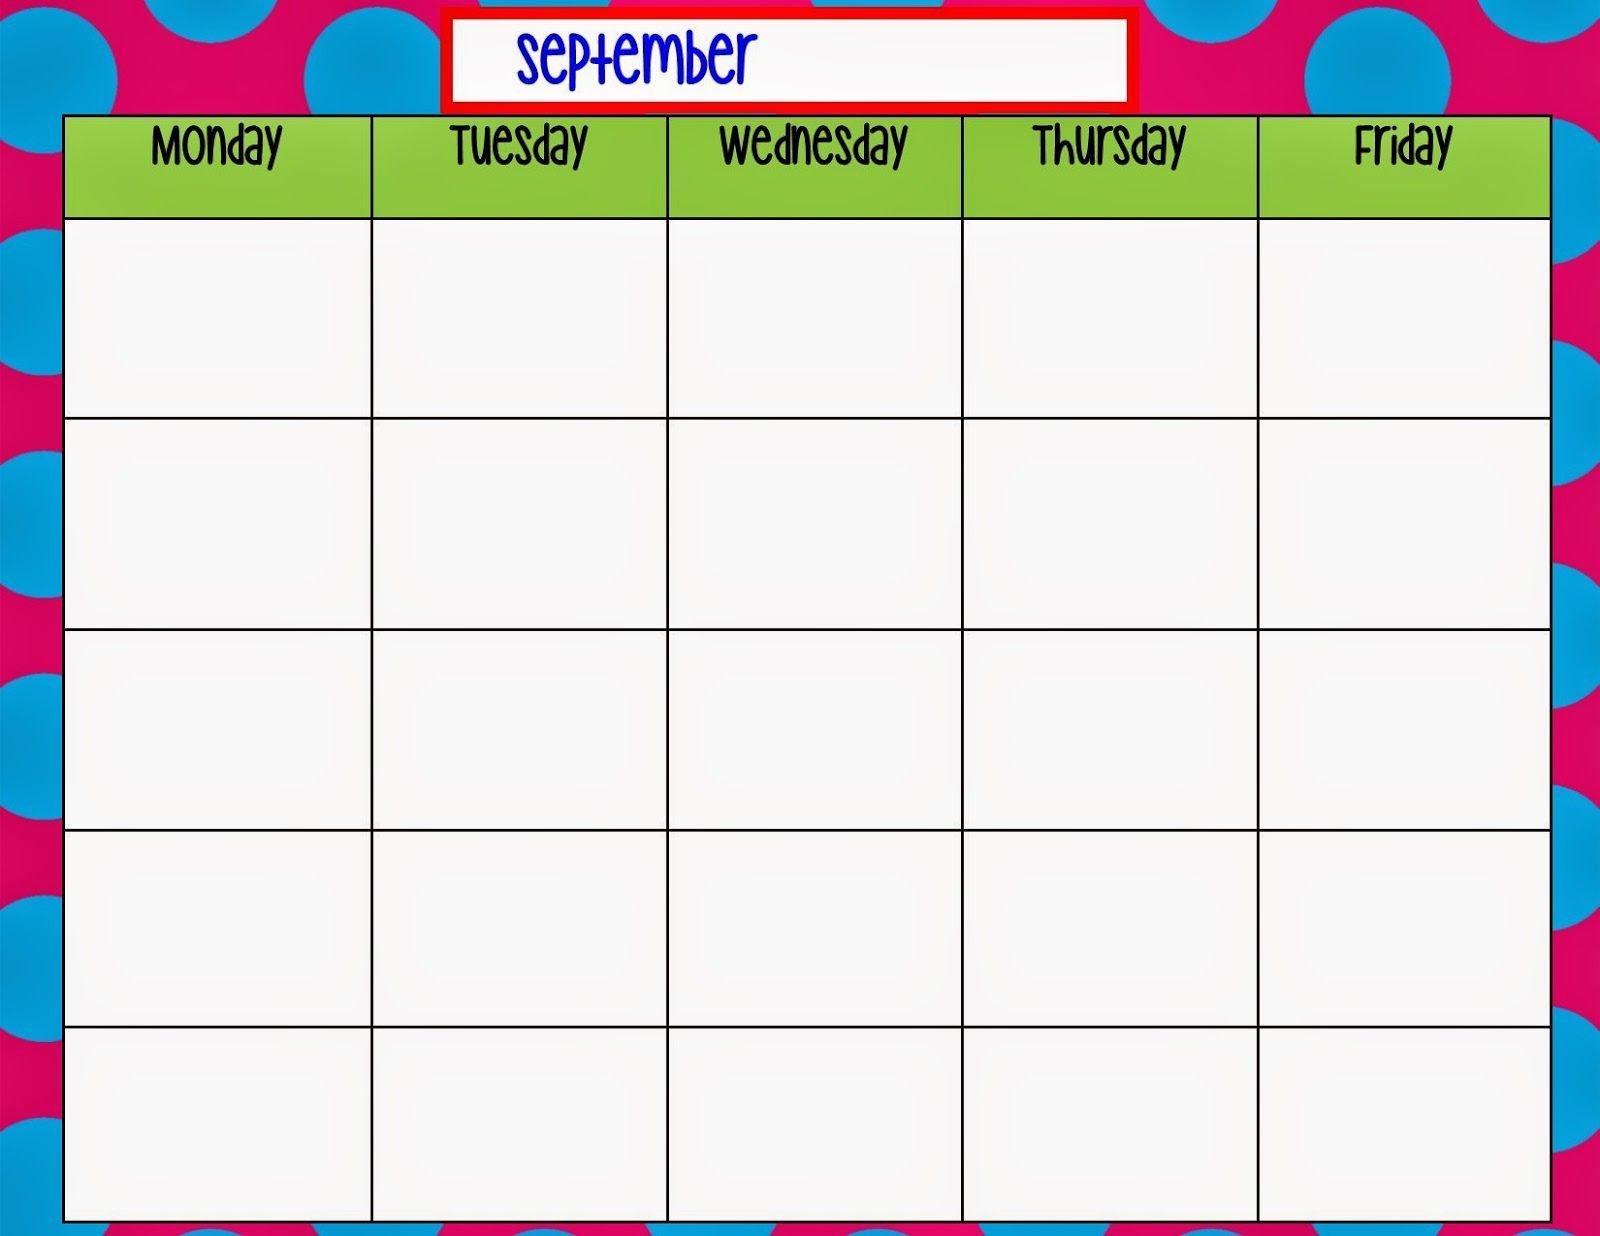 Monday Through Friday Calendar Template (With Images Free Printable Monday Friday Calendar